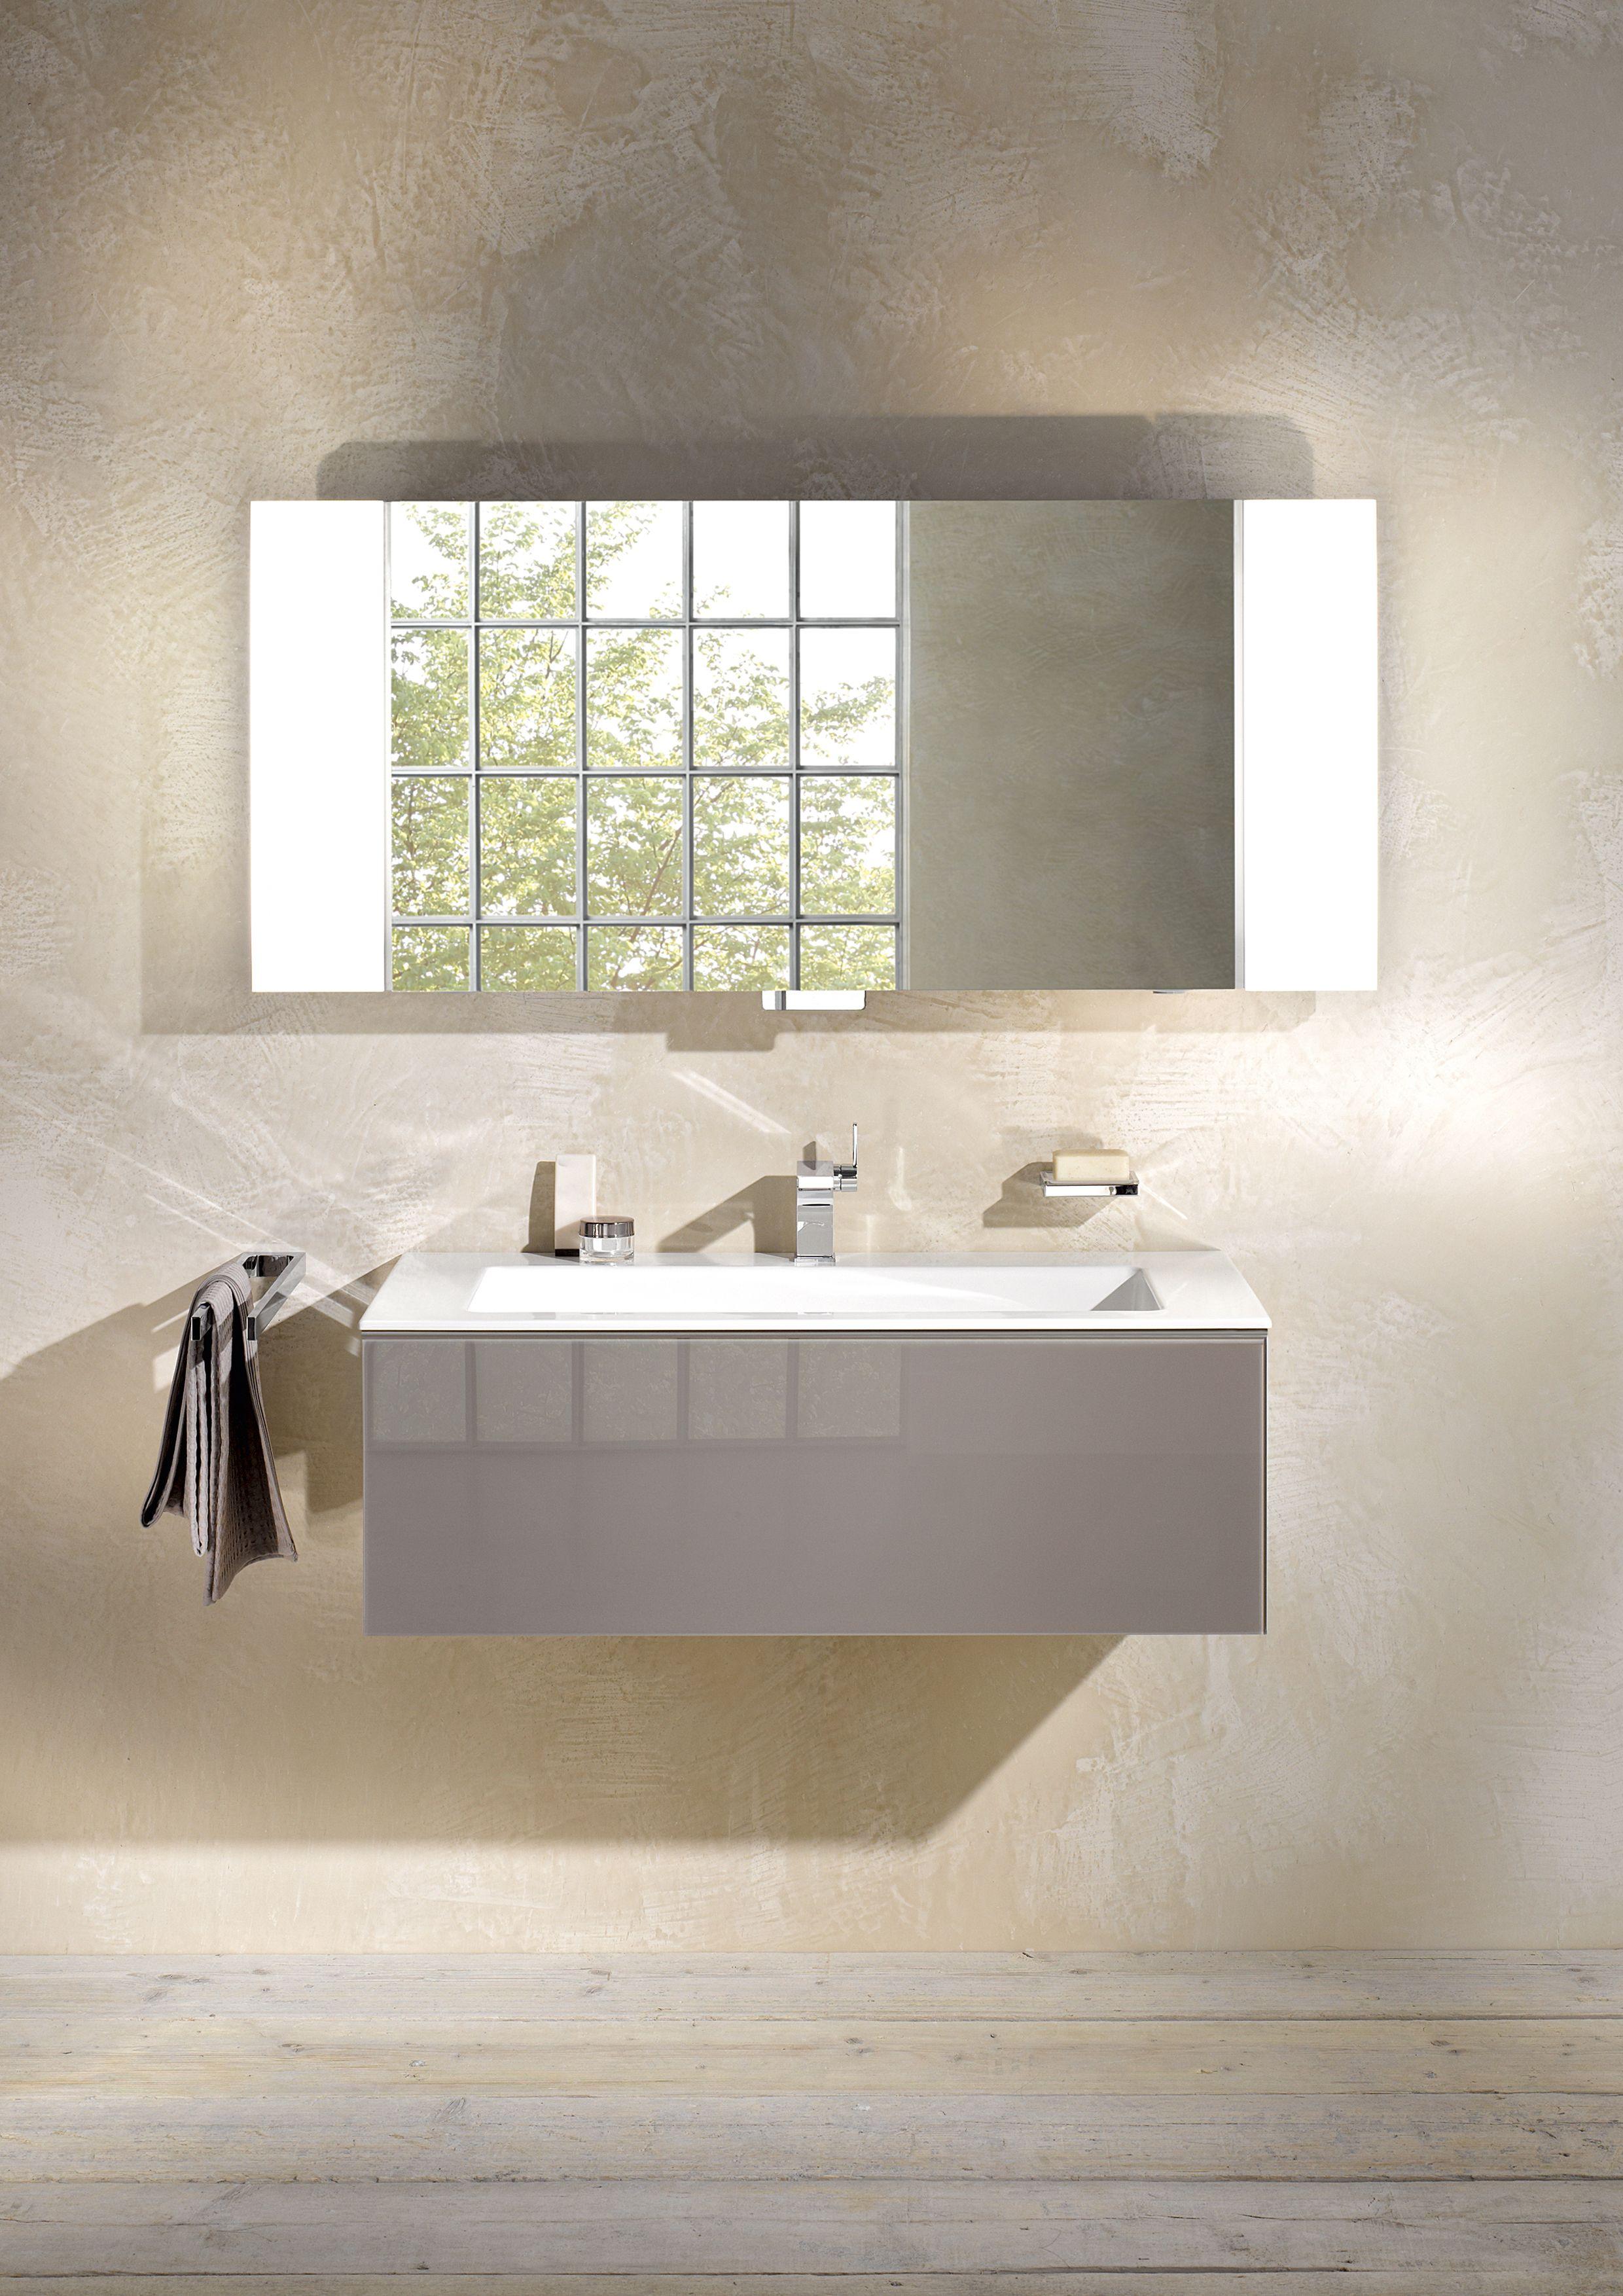 EDITION 18 #bathroom #architecture #keuco #design  Modernes